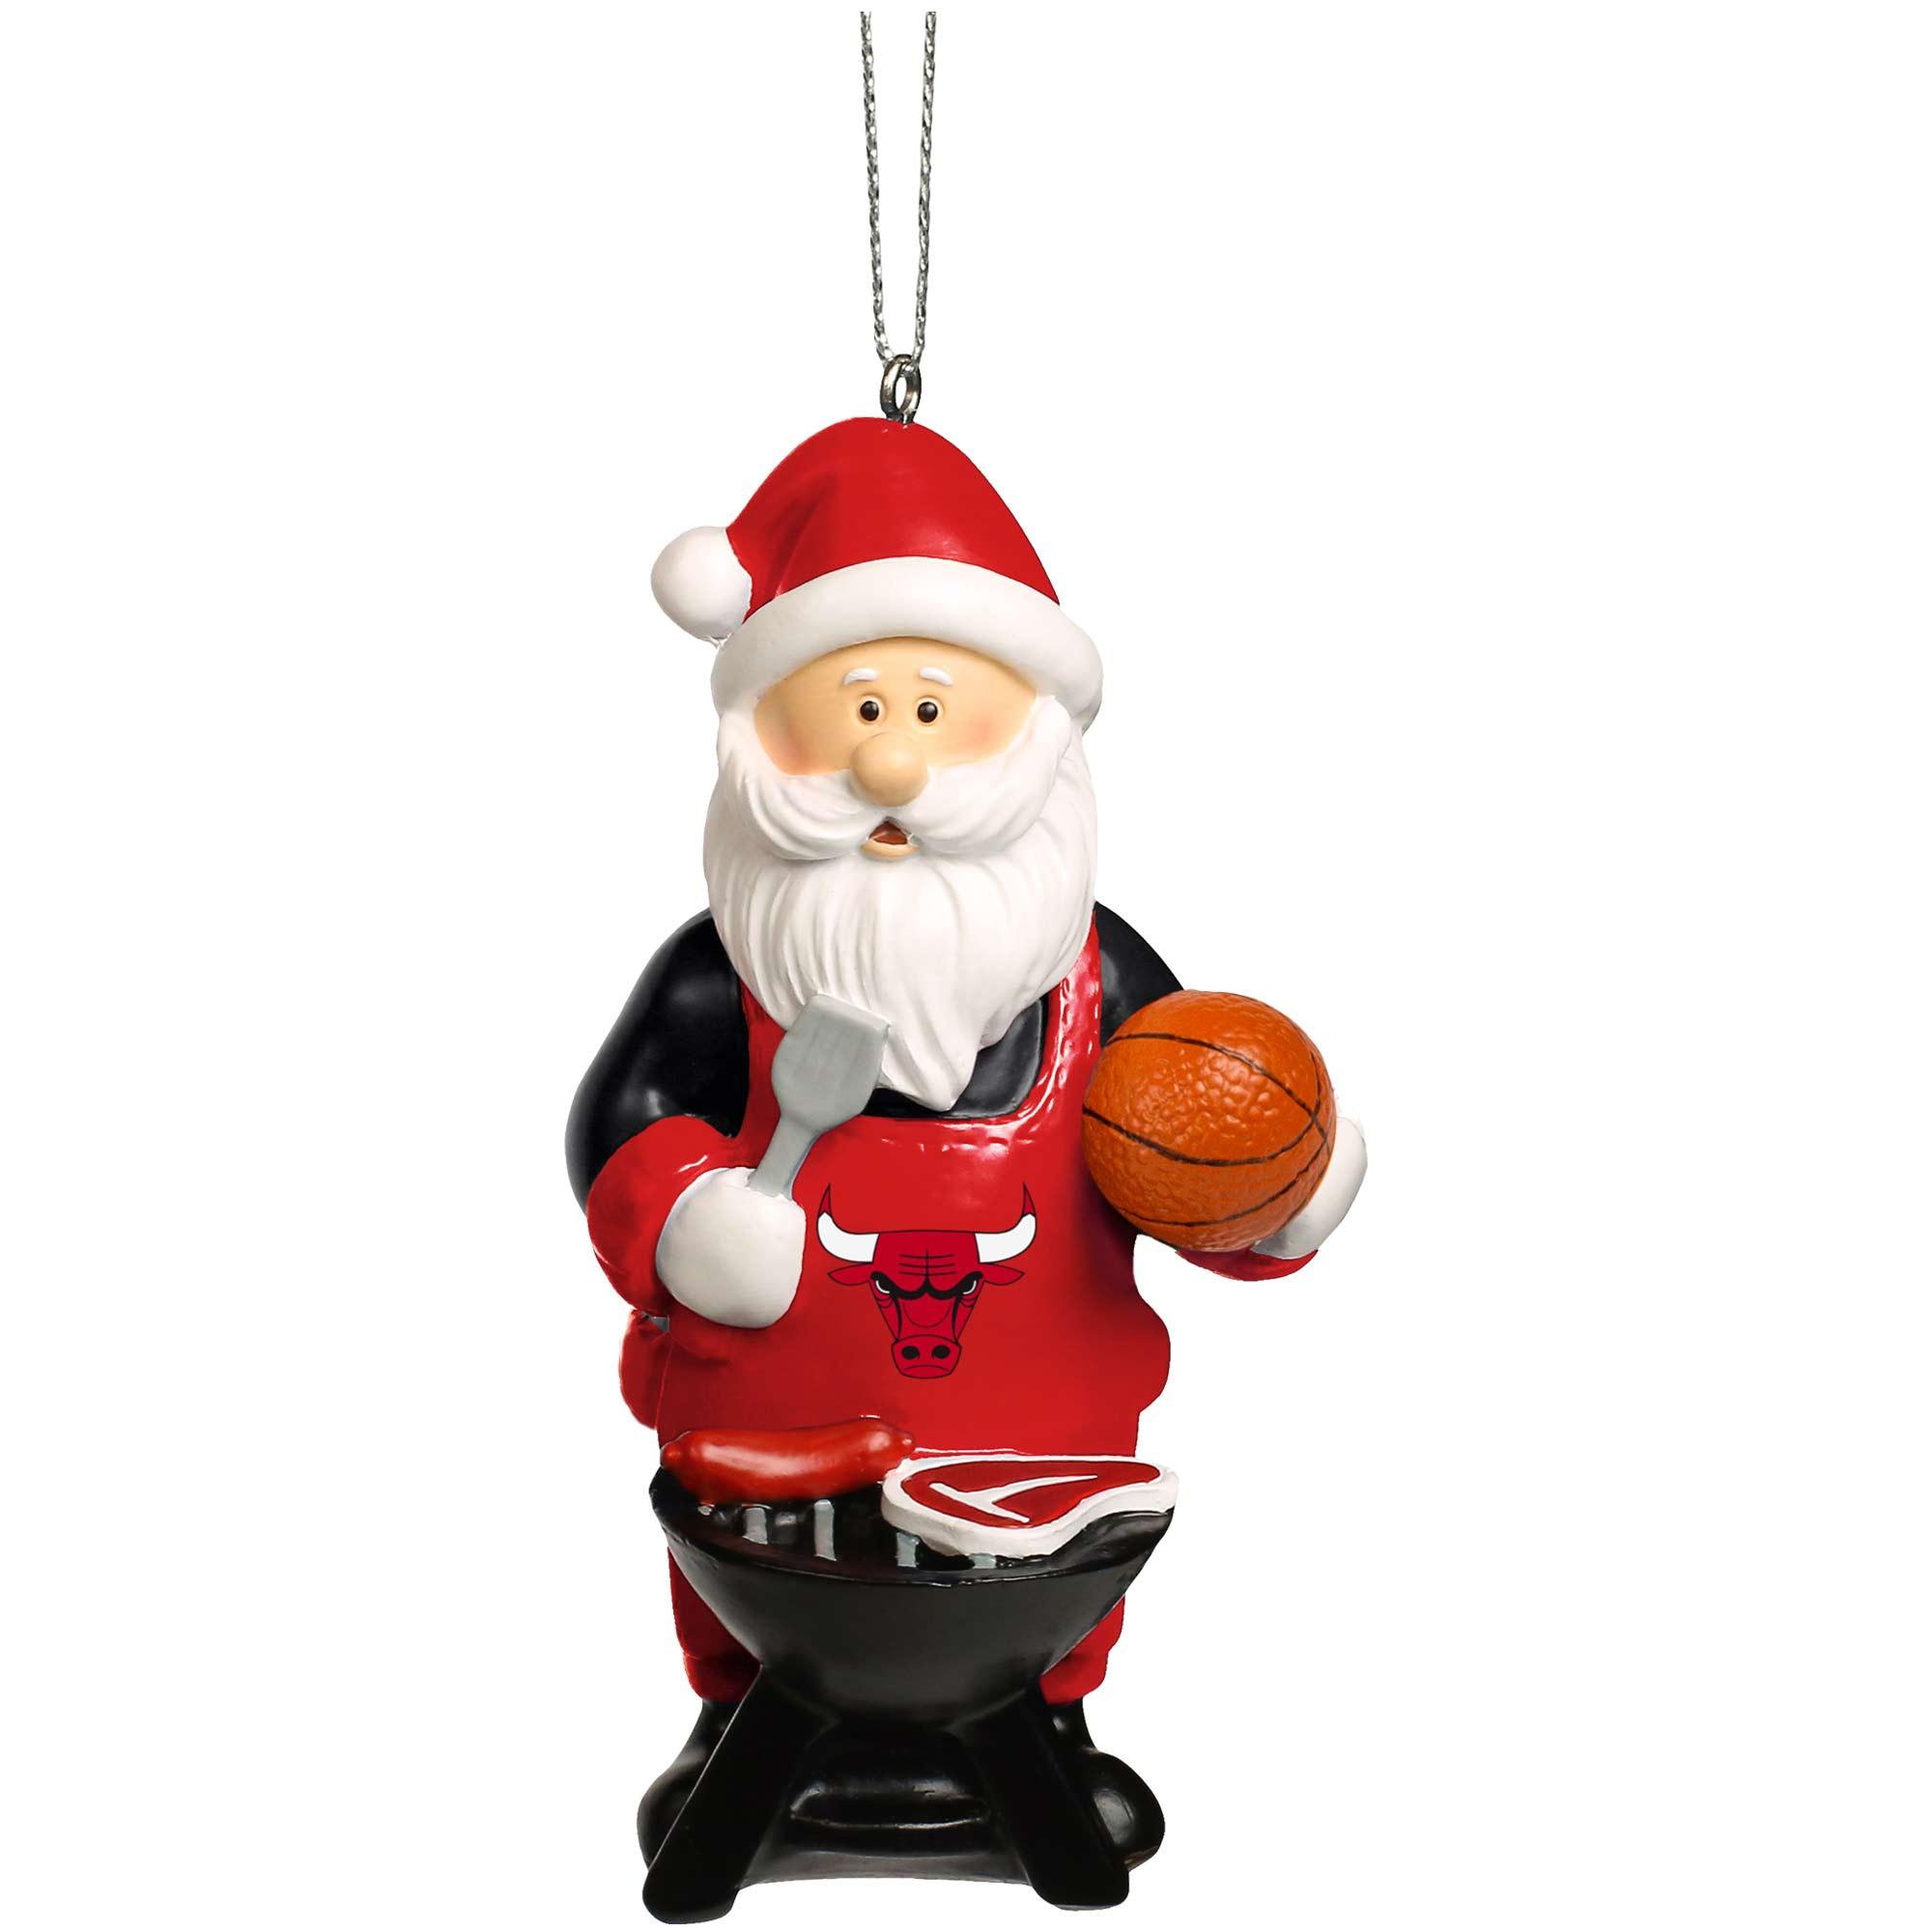 Chicago Bulls Santa Grill Ornament